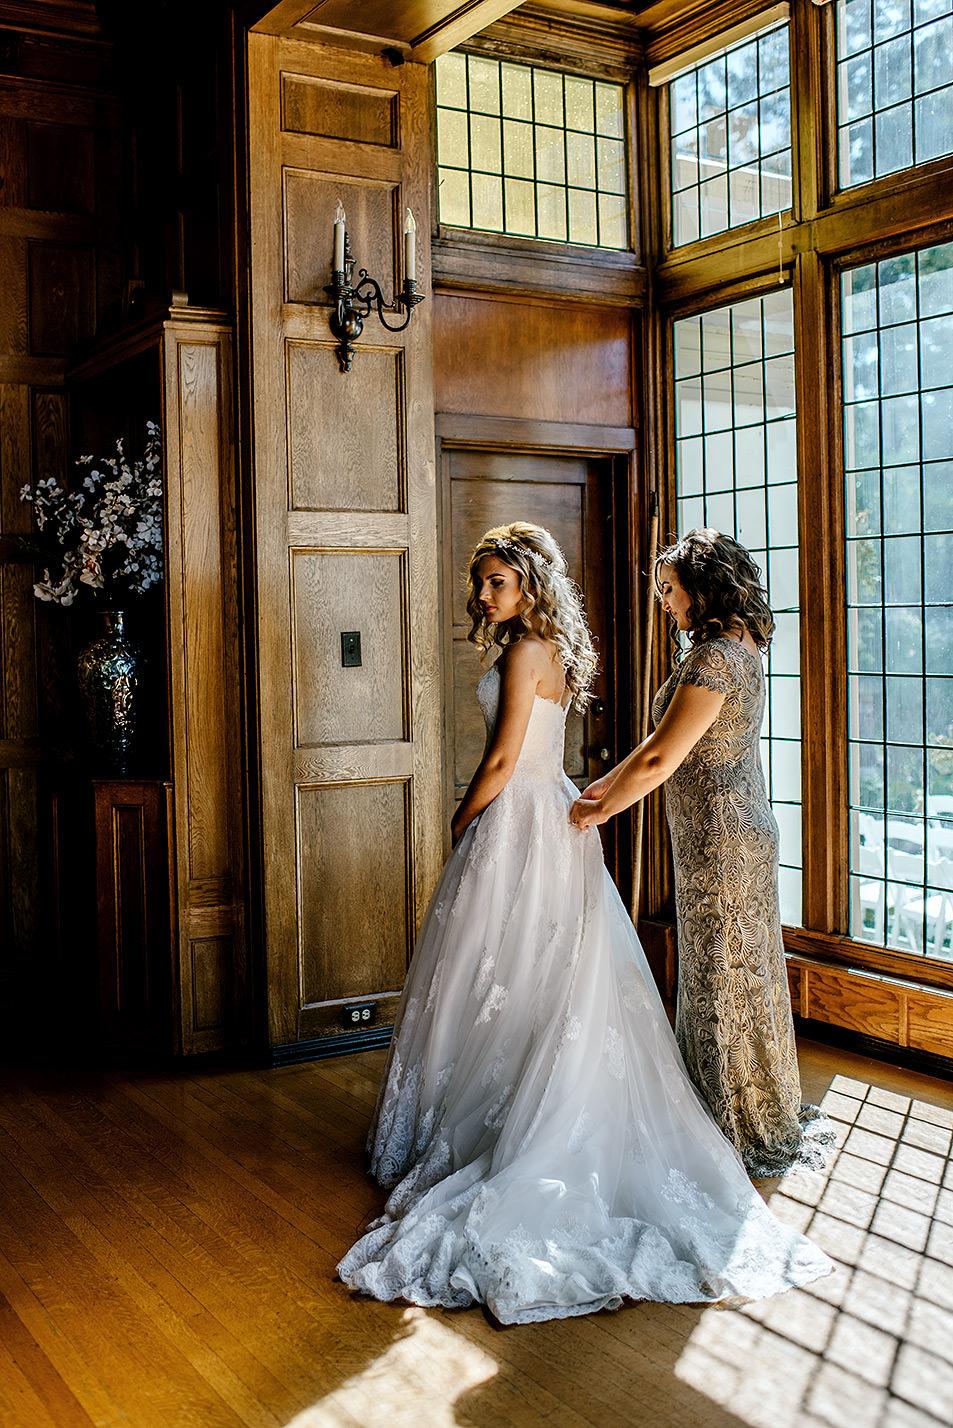 Lairmont_Manor_Wedding033.jpg